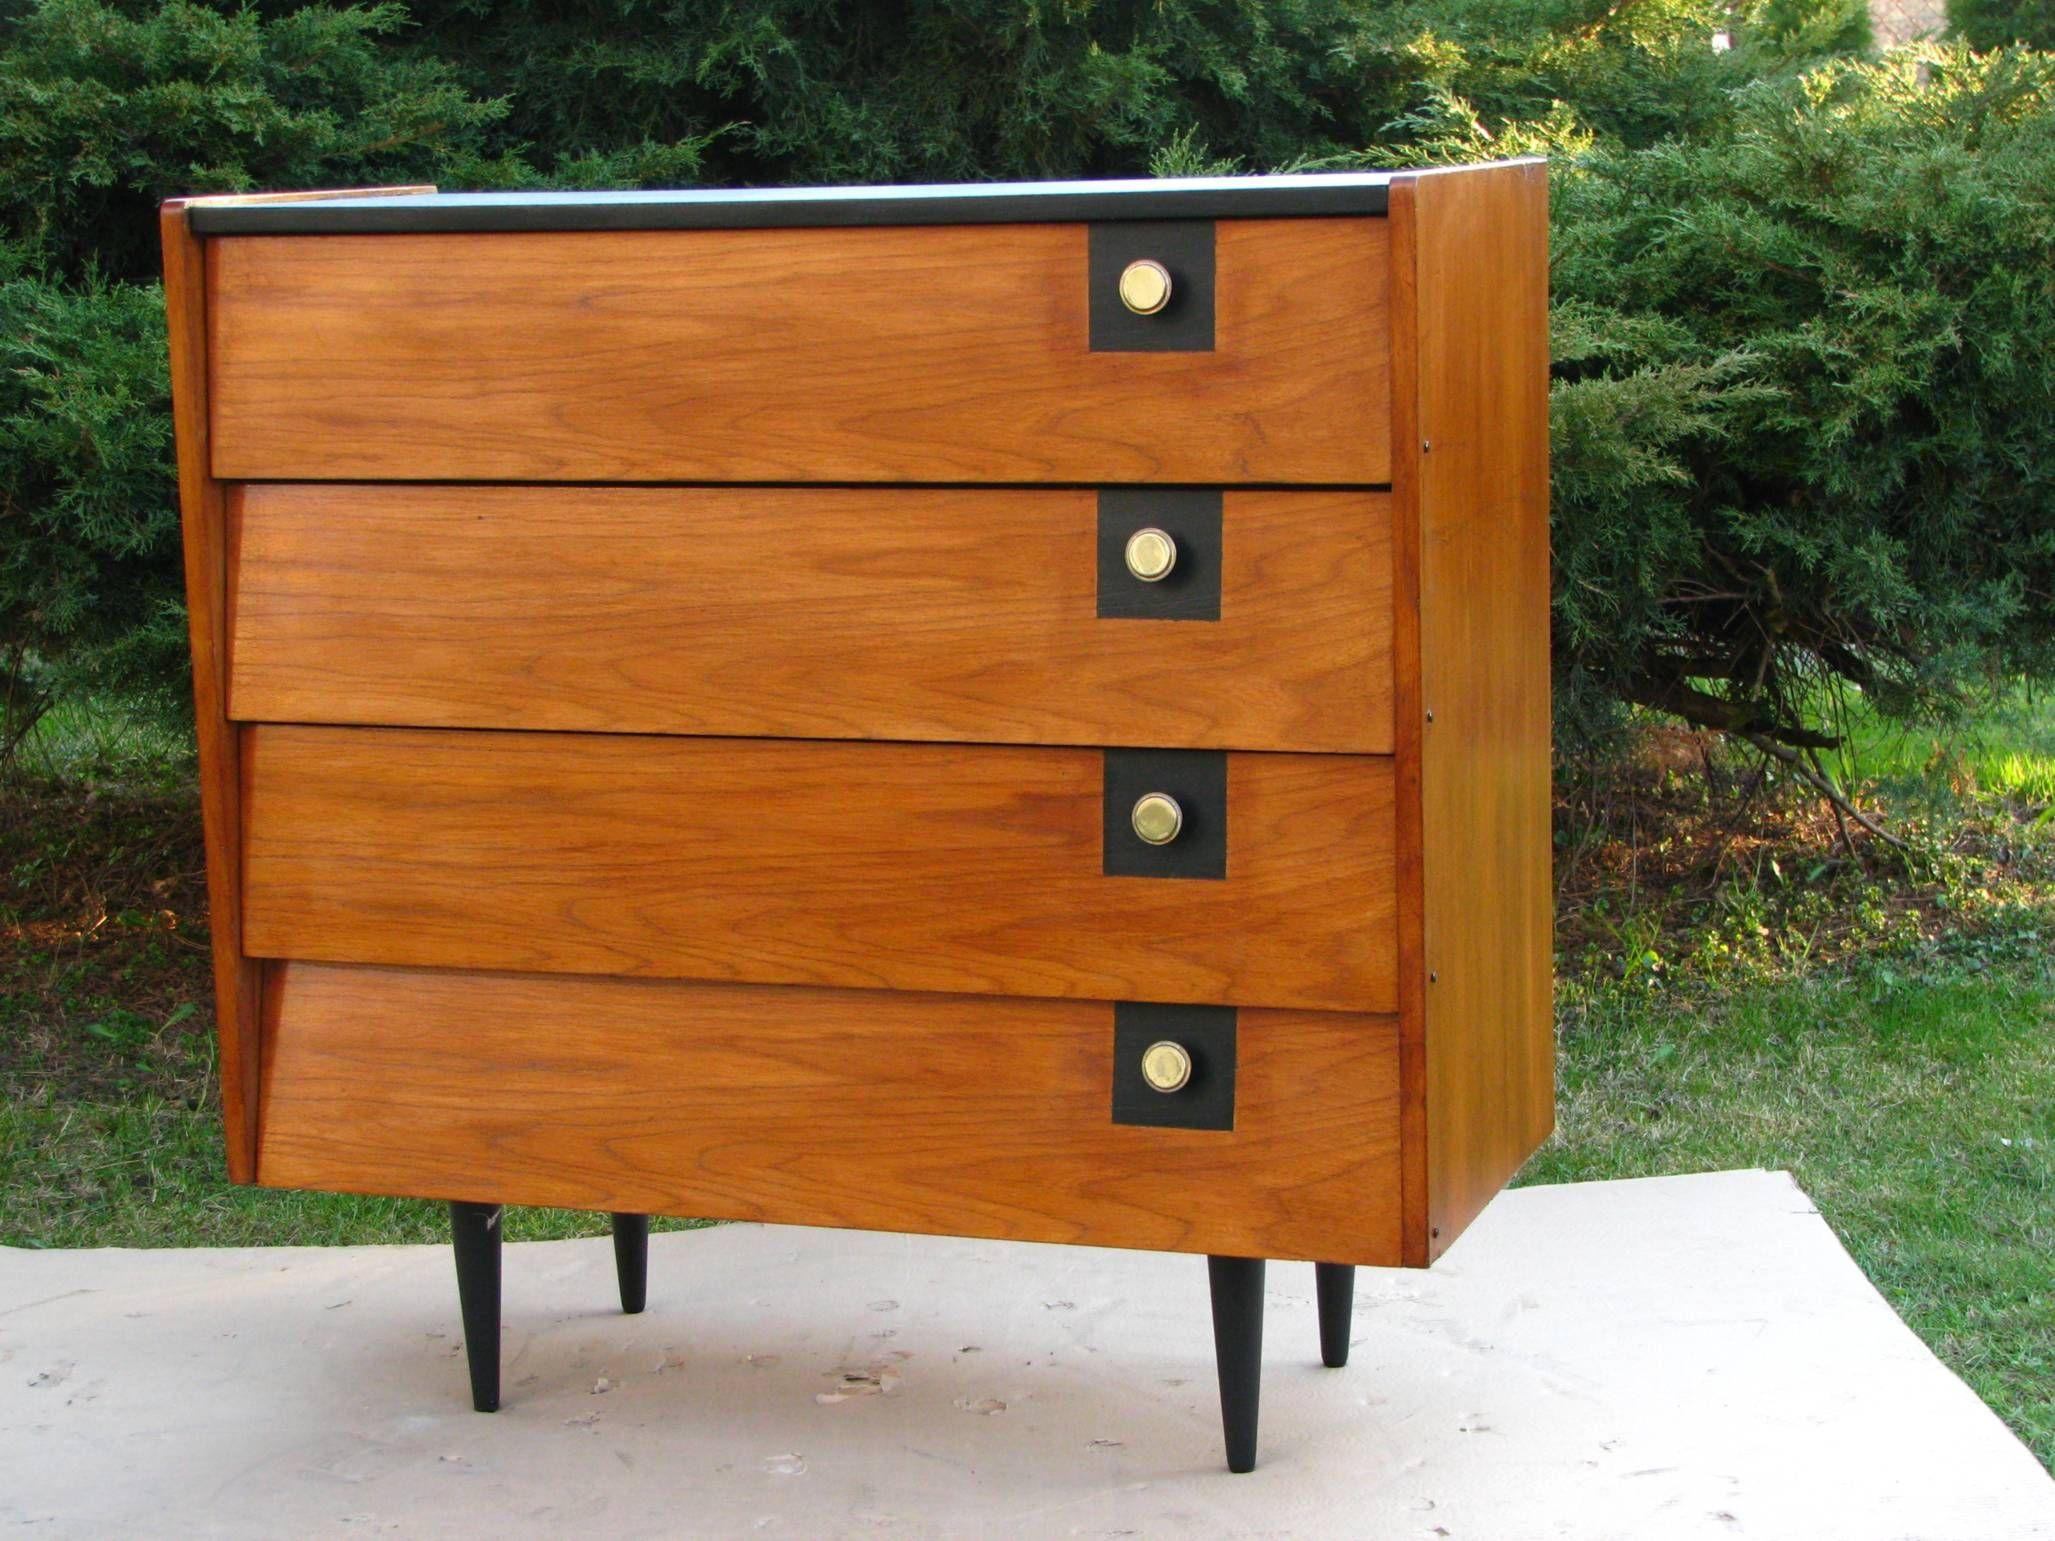 Szafka Komoda Na Buty Vintage 60 70 Okazja 7283205781 Oficjalne Archiwum Allegro Home Decor Furniture Decor